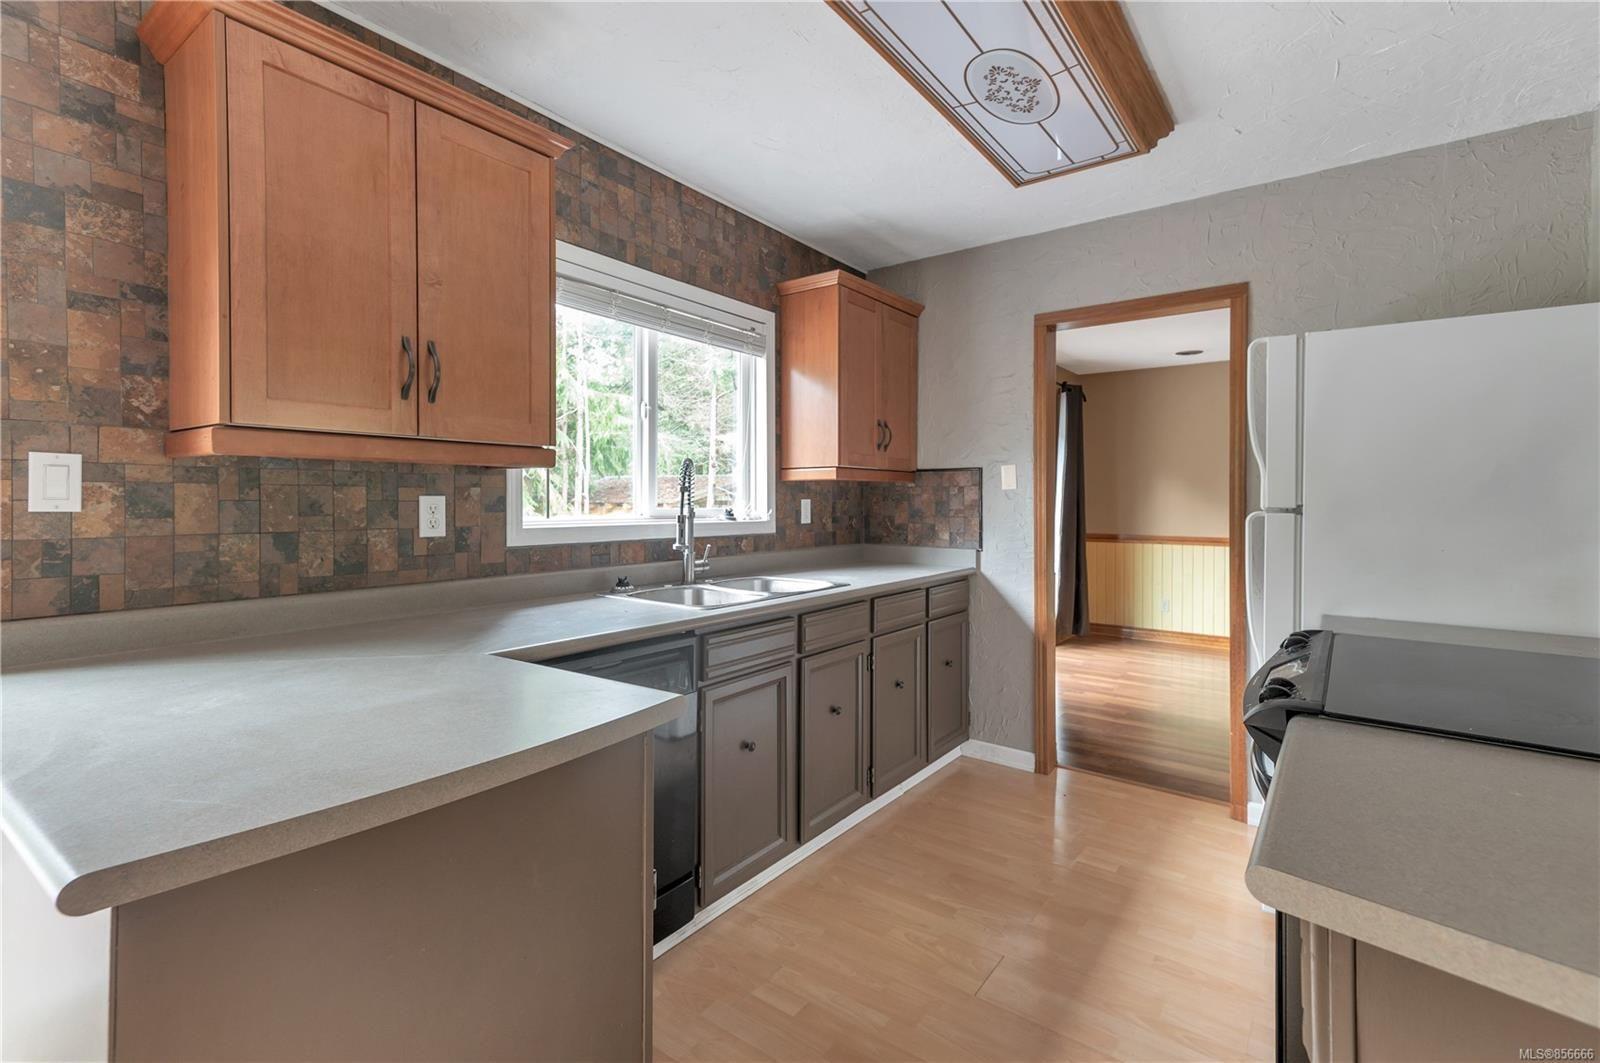 Photo 6: Photos: 2468 Oakes Rd in : CV Merville Black Creek House for sale (Comox Valley)  : MLS®# 856666